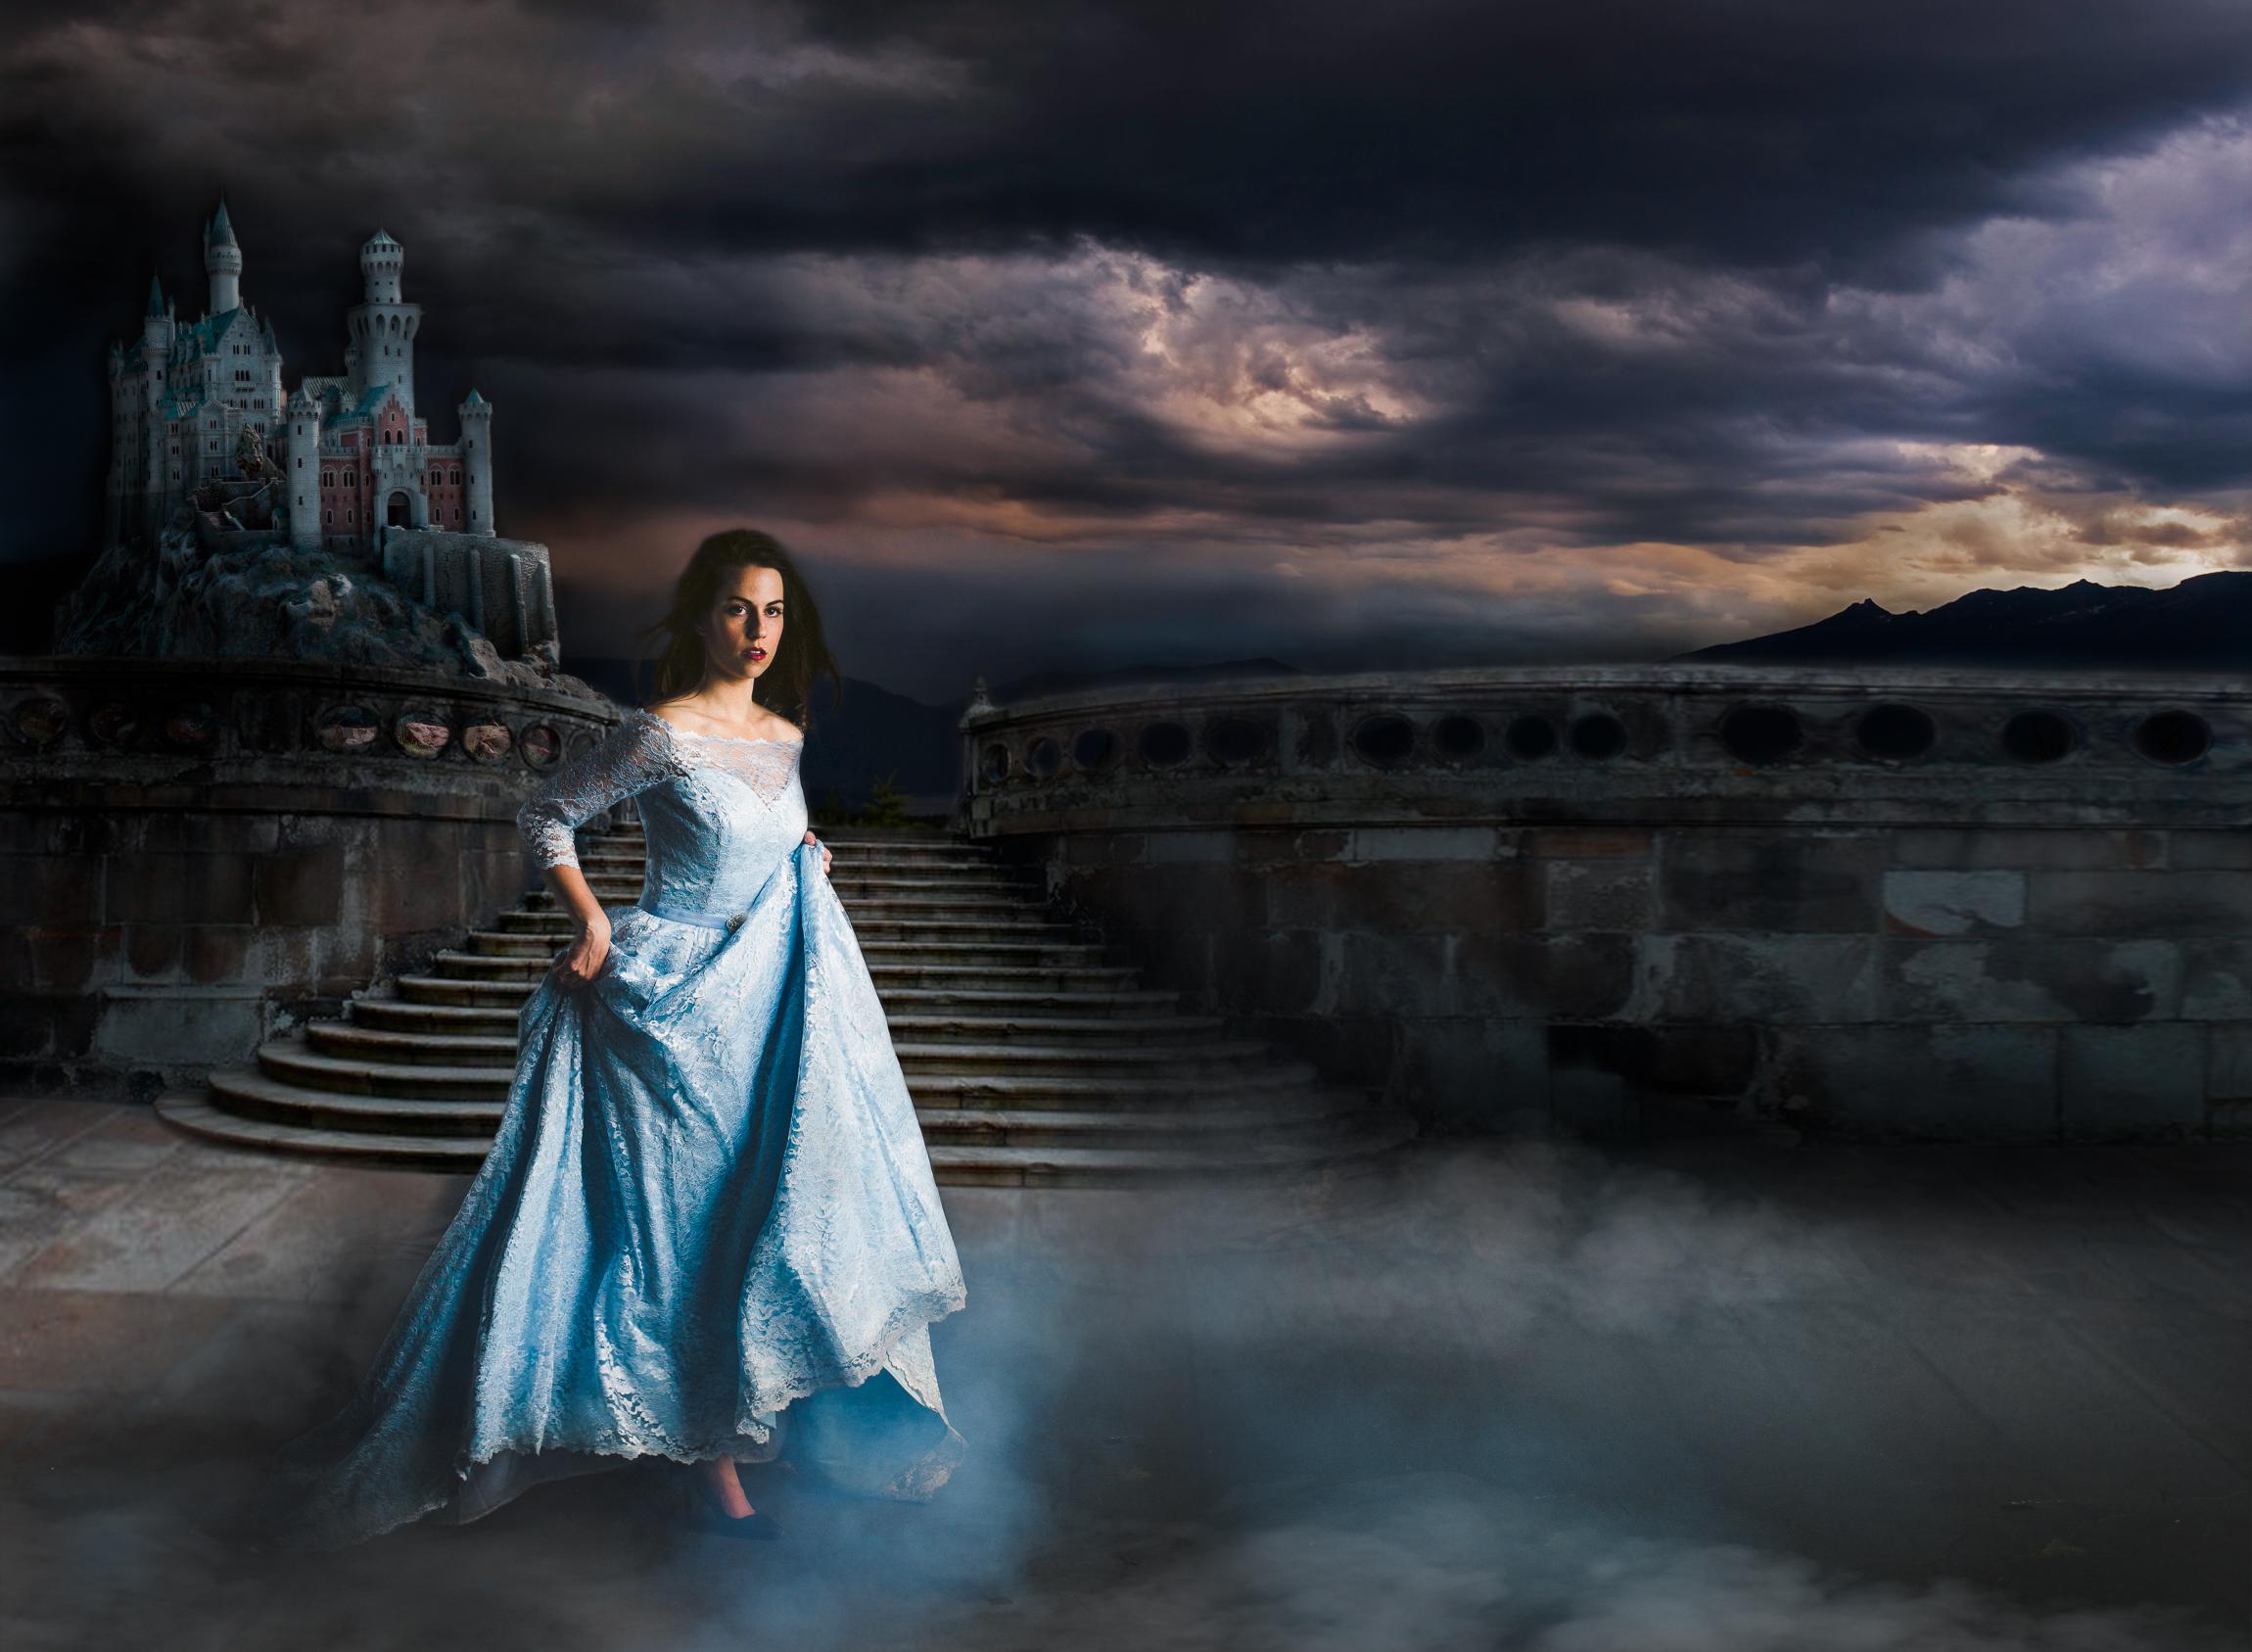 Jen_Montgomery_Photography_CinderellaCinemaSM.jpg